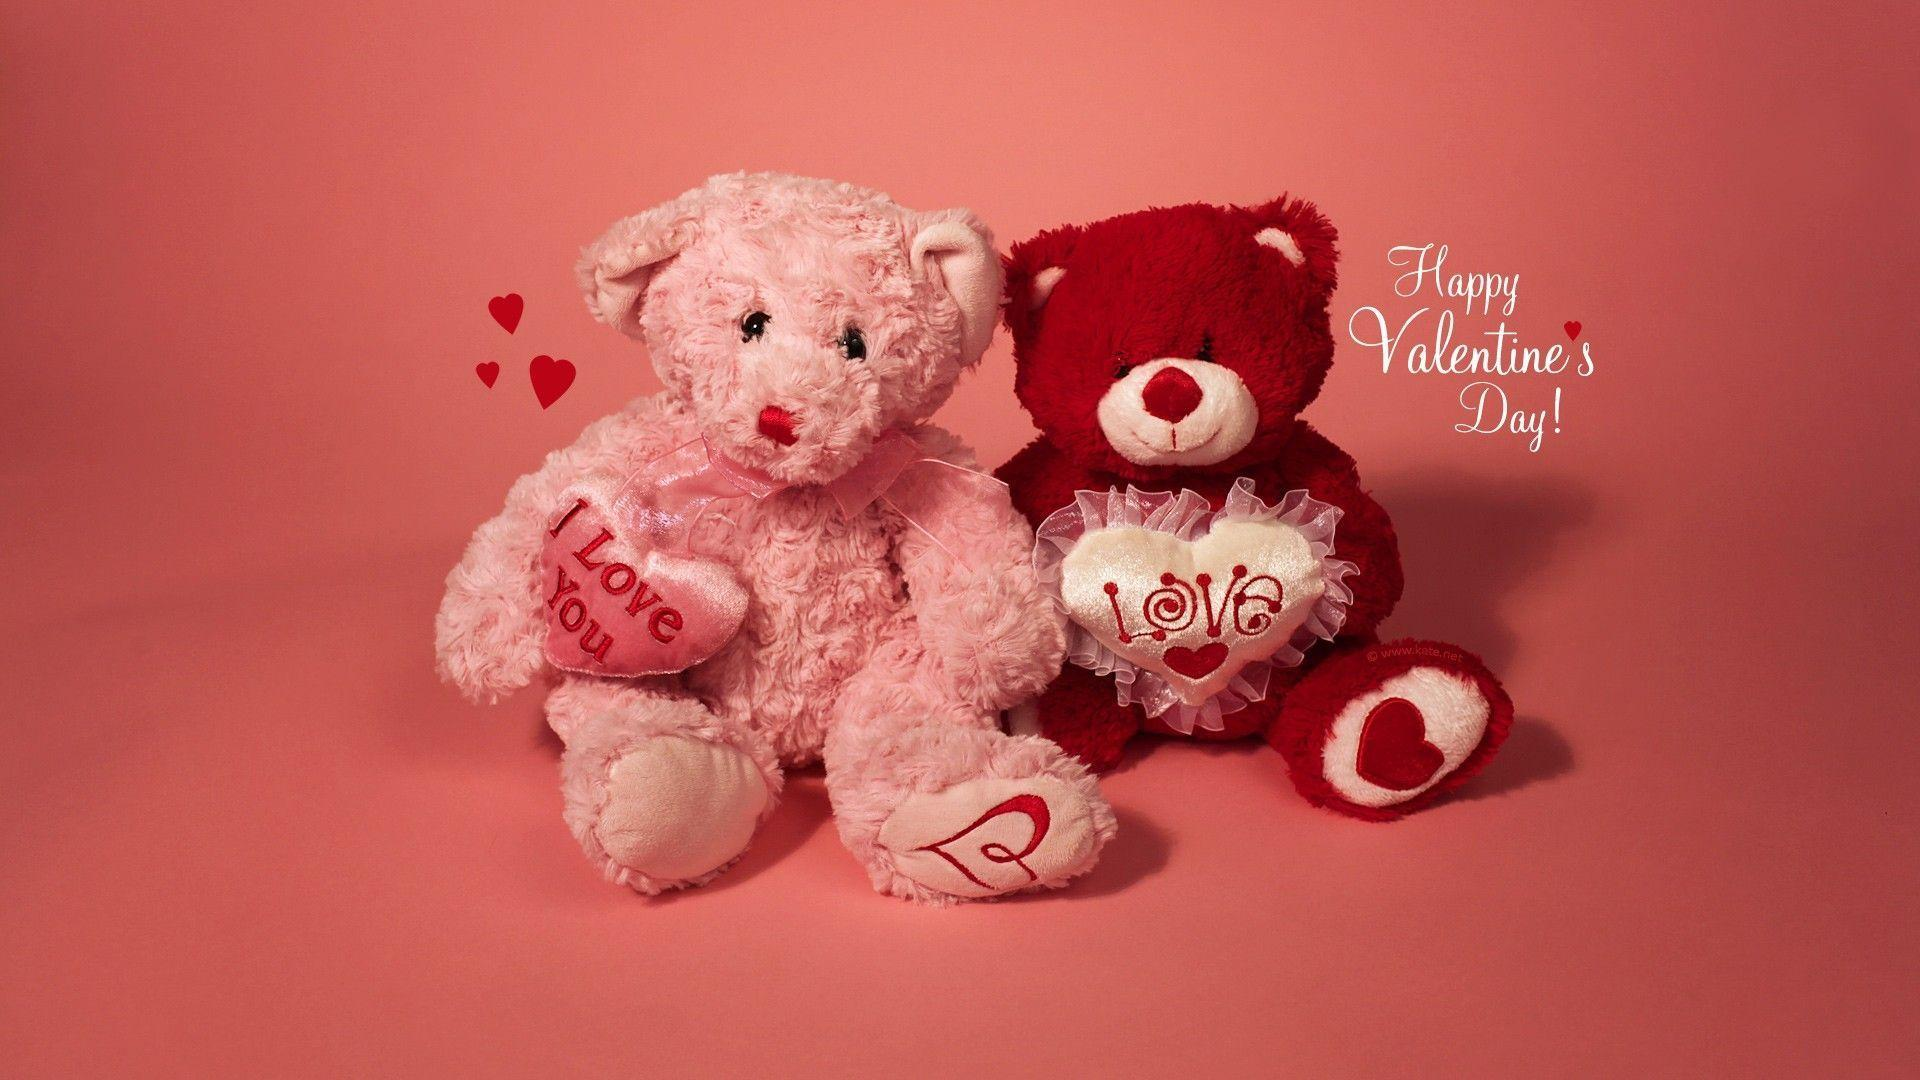 1920x1080 Cute Valentines Day Background